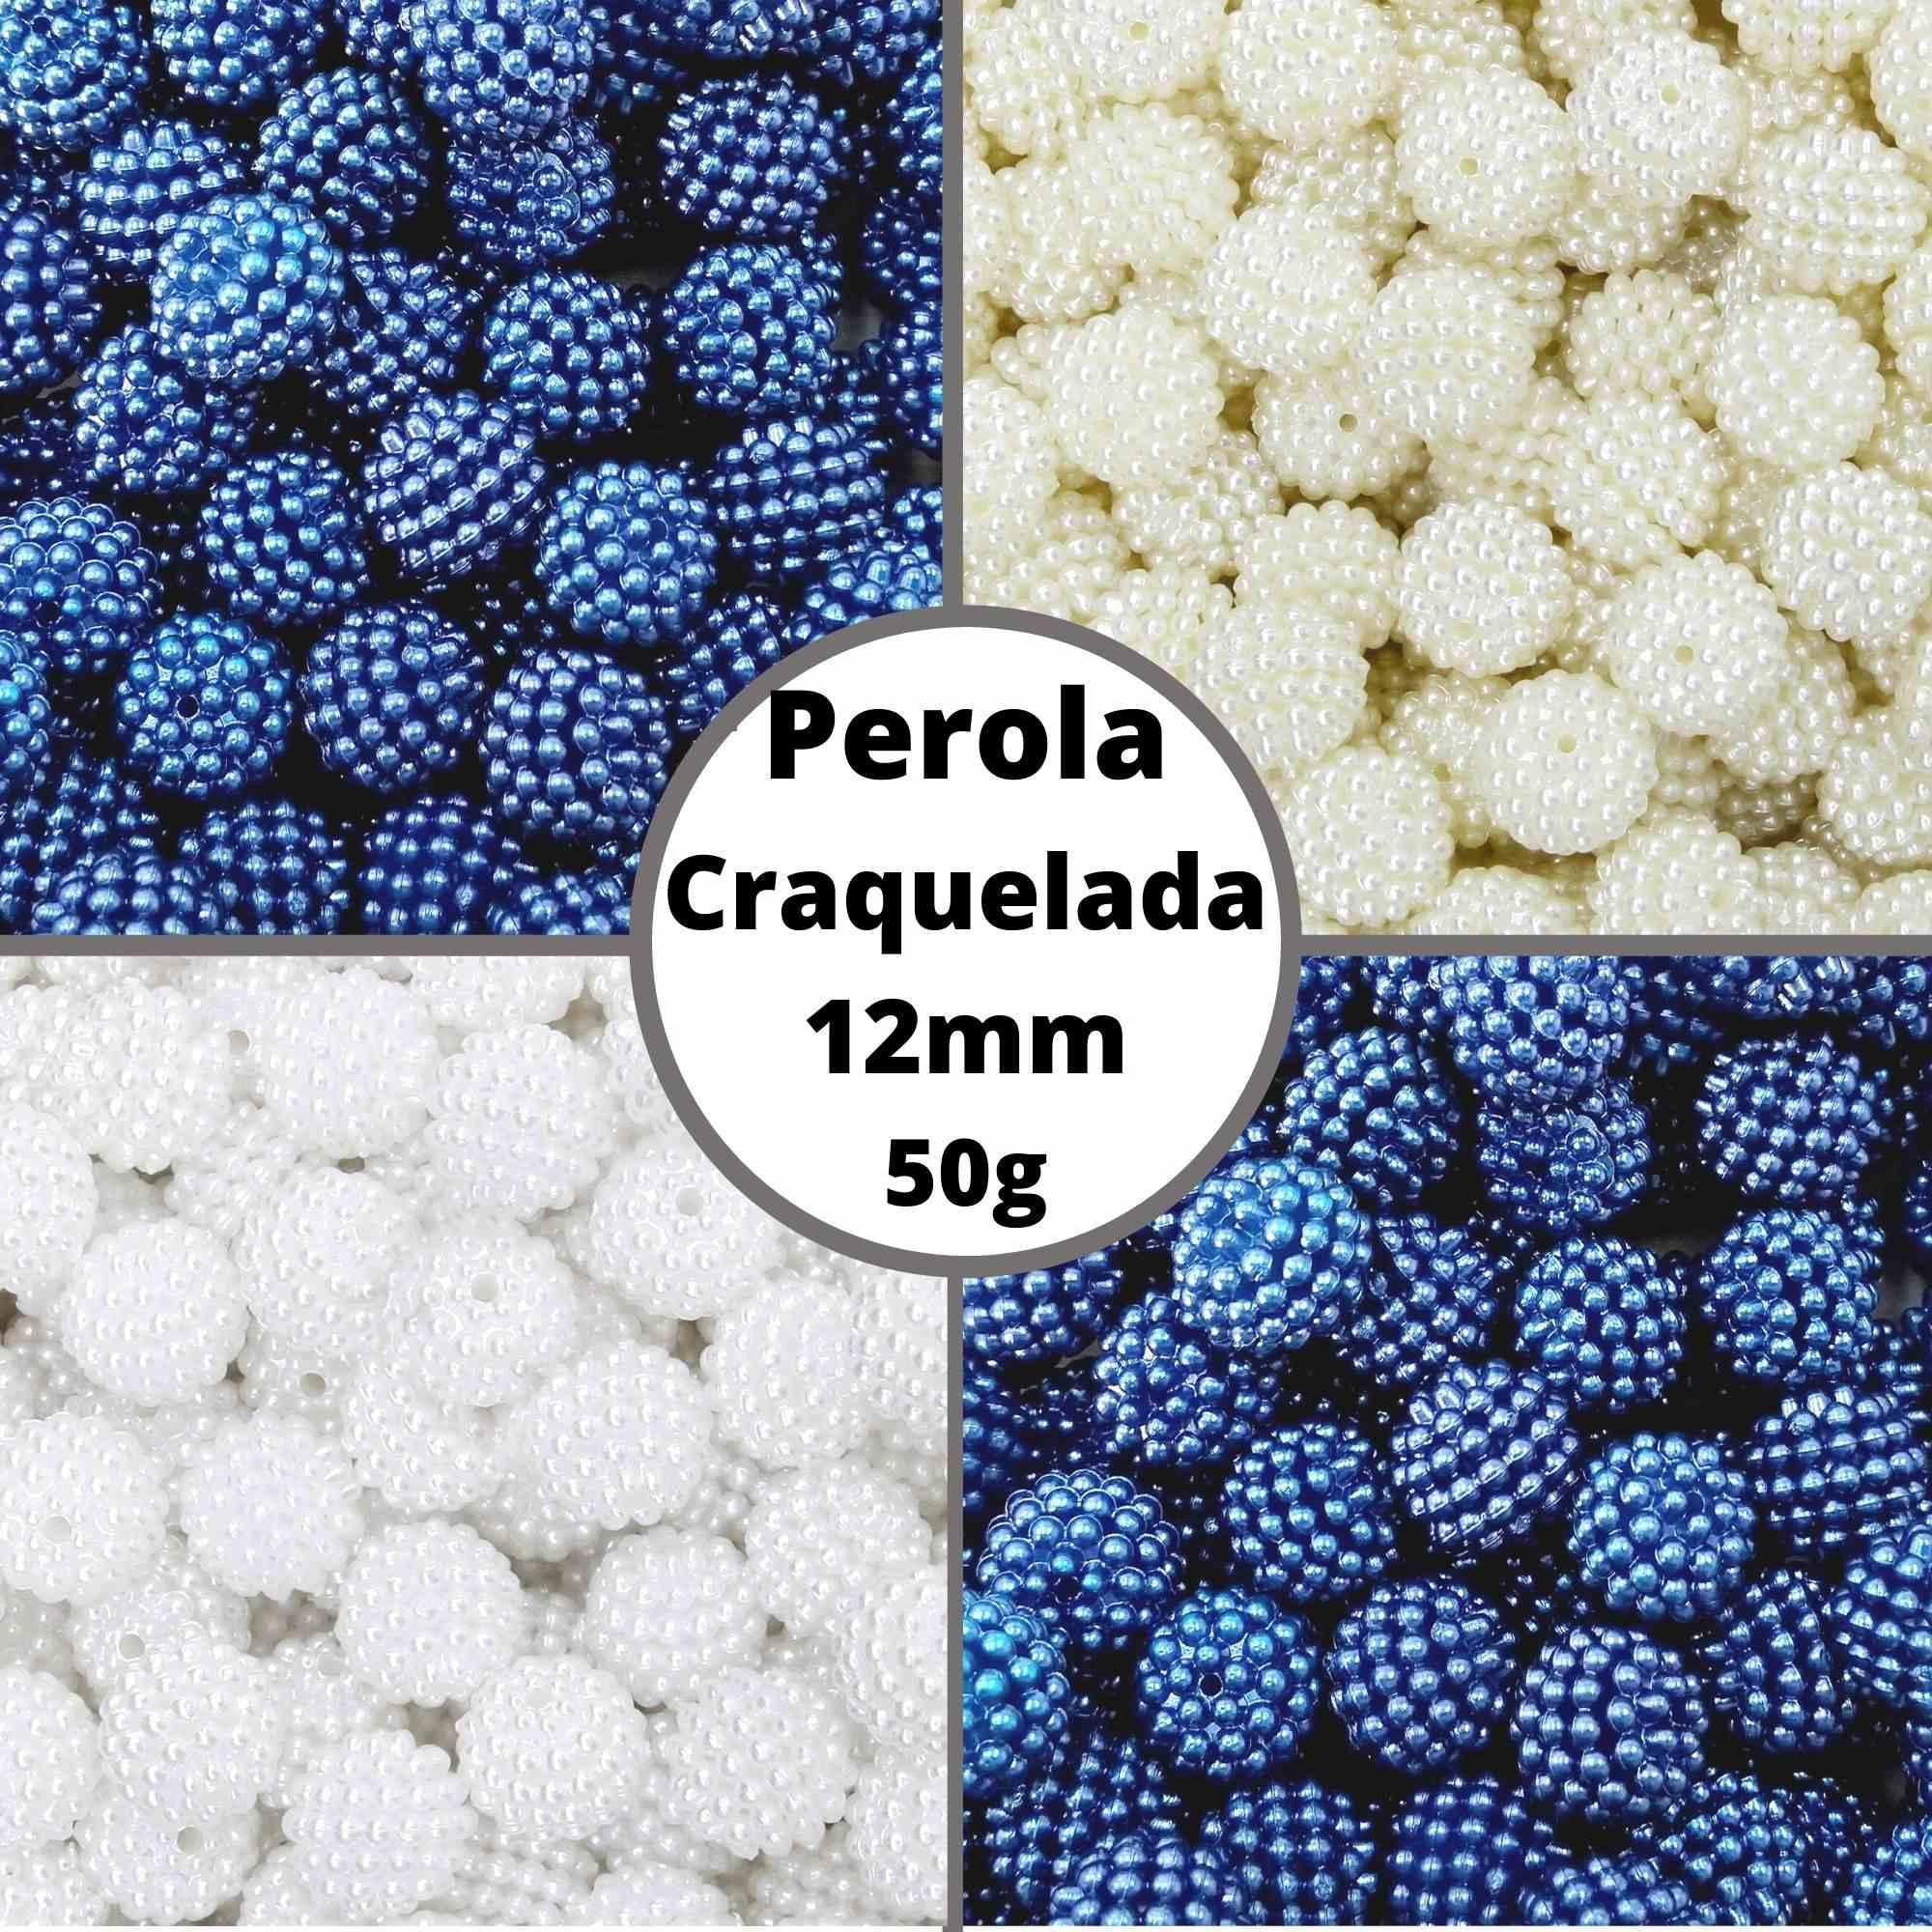 Pérola Inteira Craquelada ABS CLR 12mm - Pacote 50g